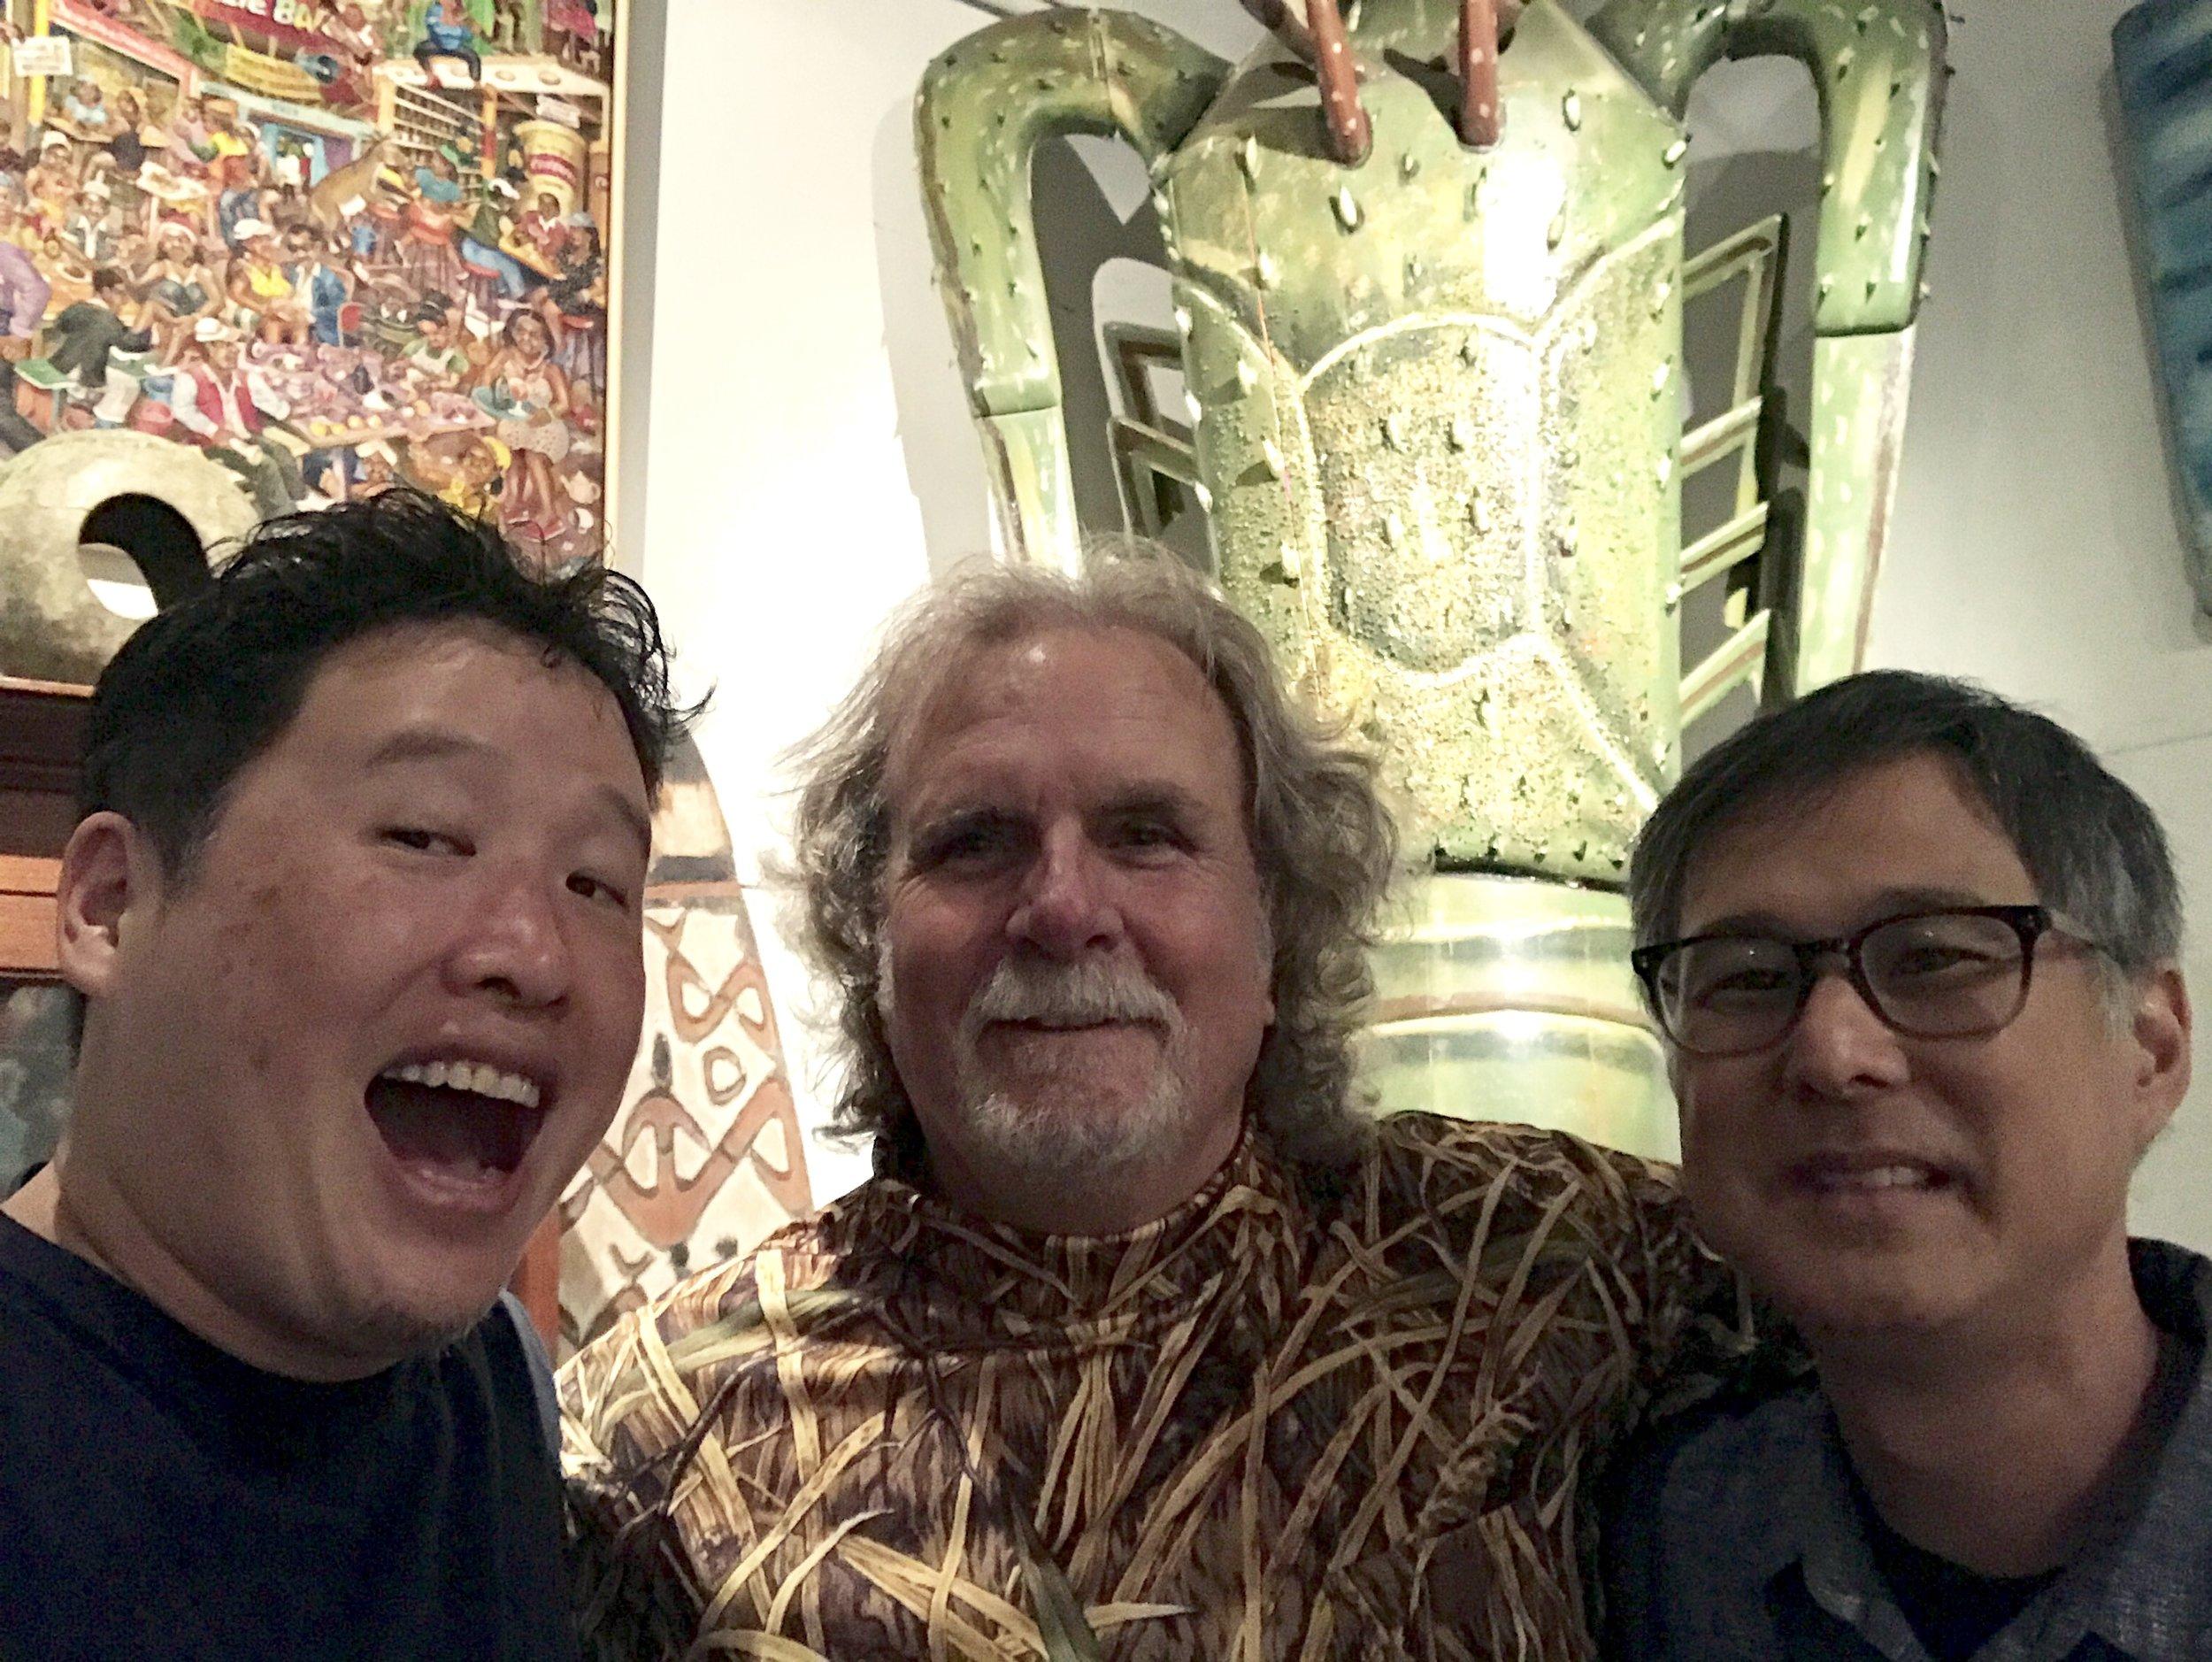 Luke Chueh, Ernie Wolfe and Eric Nakamura